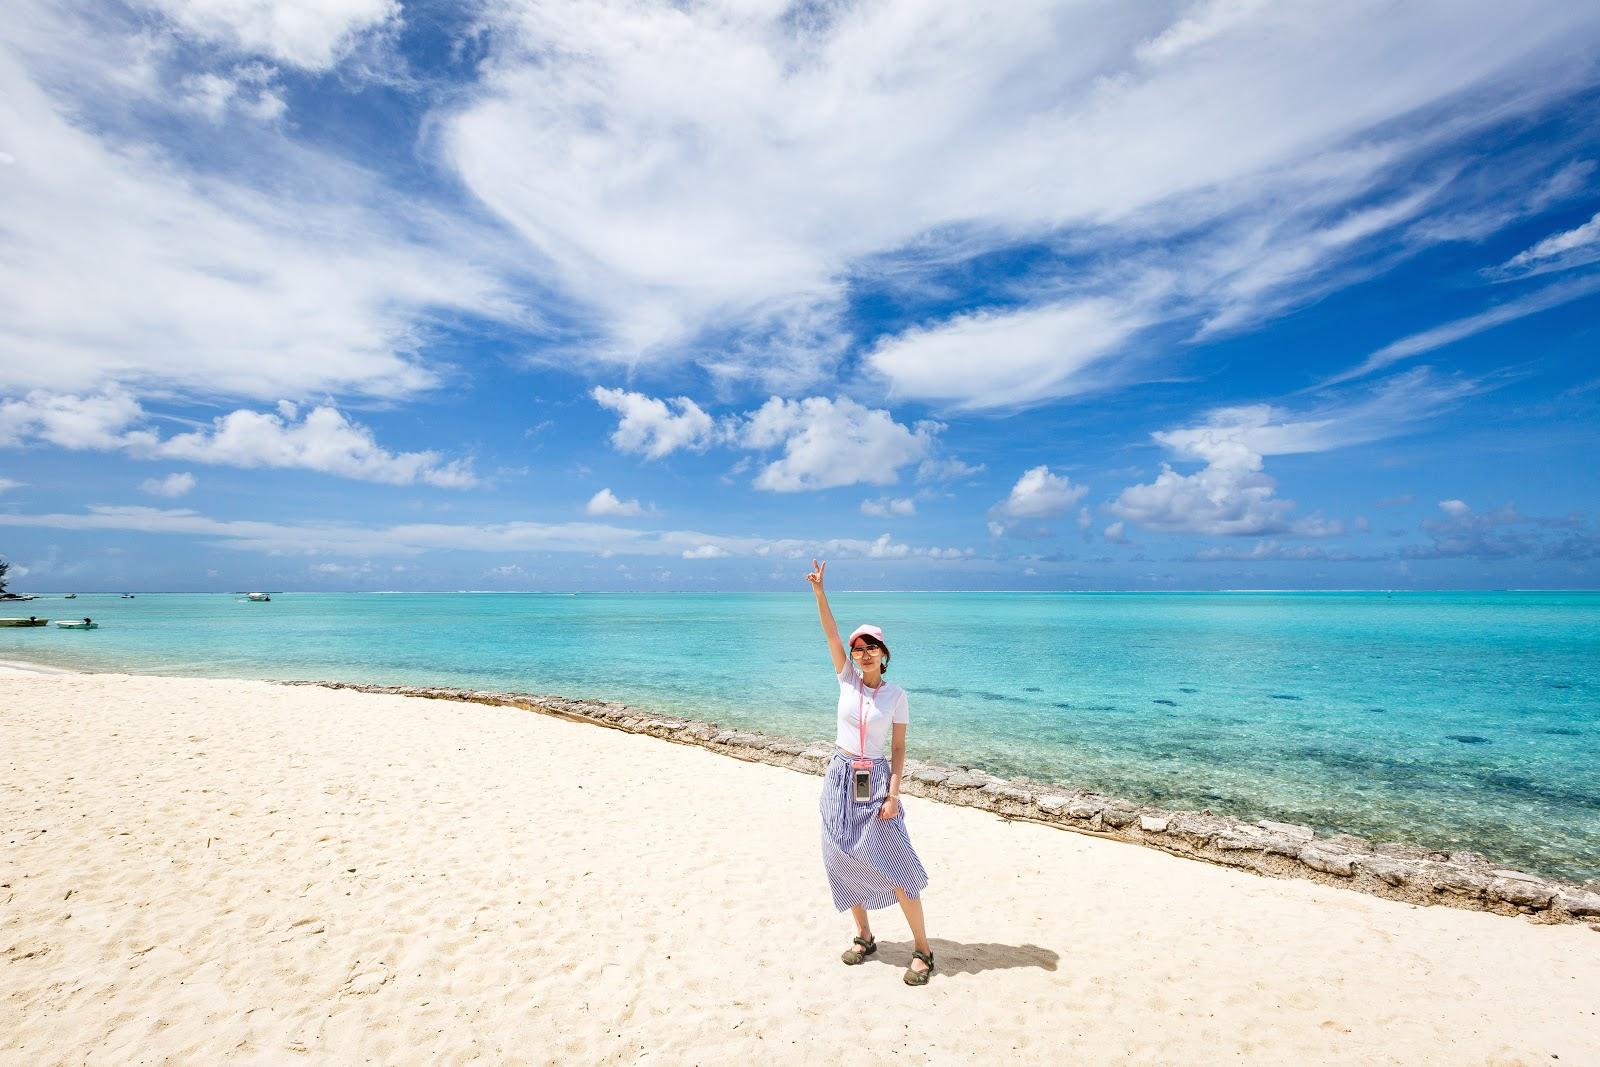 Matira Beach 是本島Vaitape唯一的公共海灘,沙灘是細緻的白砂,海水則是這裡最經典的Tiffany色。從艾美過來的路上(應該說海上...XD),至少看到五六種顏色的海域,真是太夢幻了